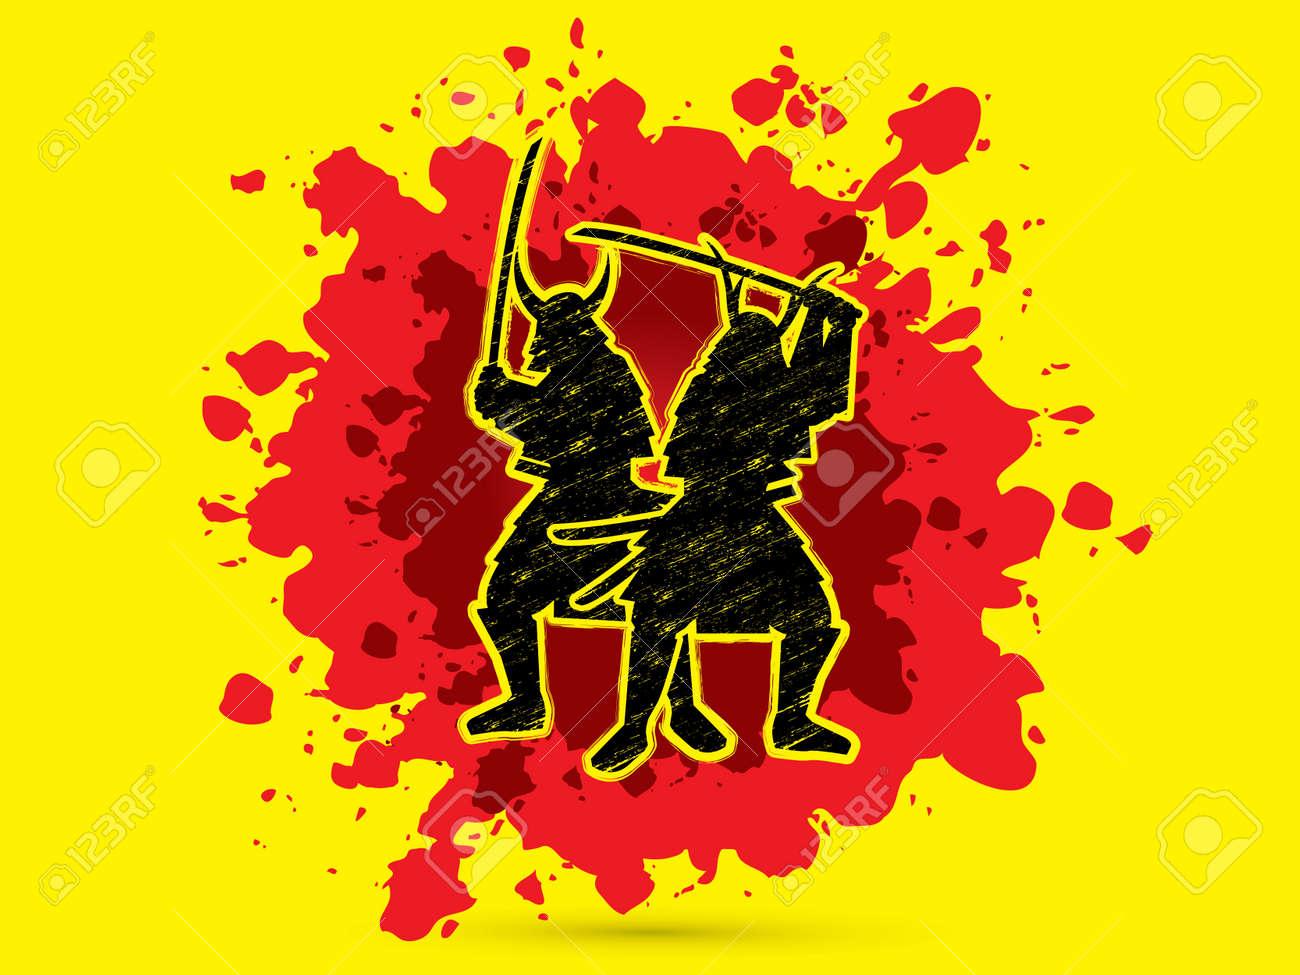 Silhouette Twin Samurai Warrior With Sword Designed Using